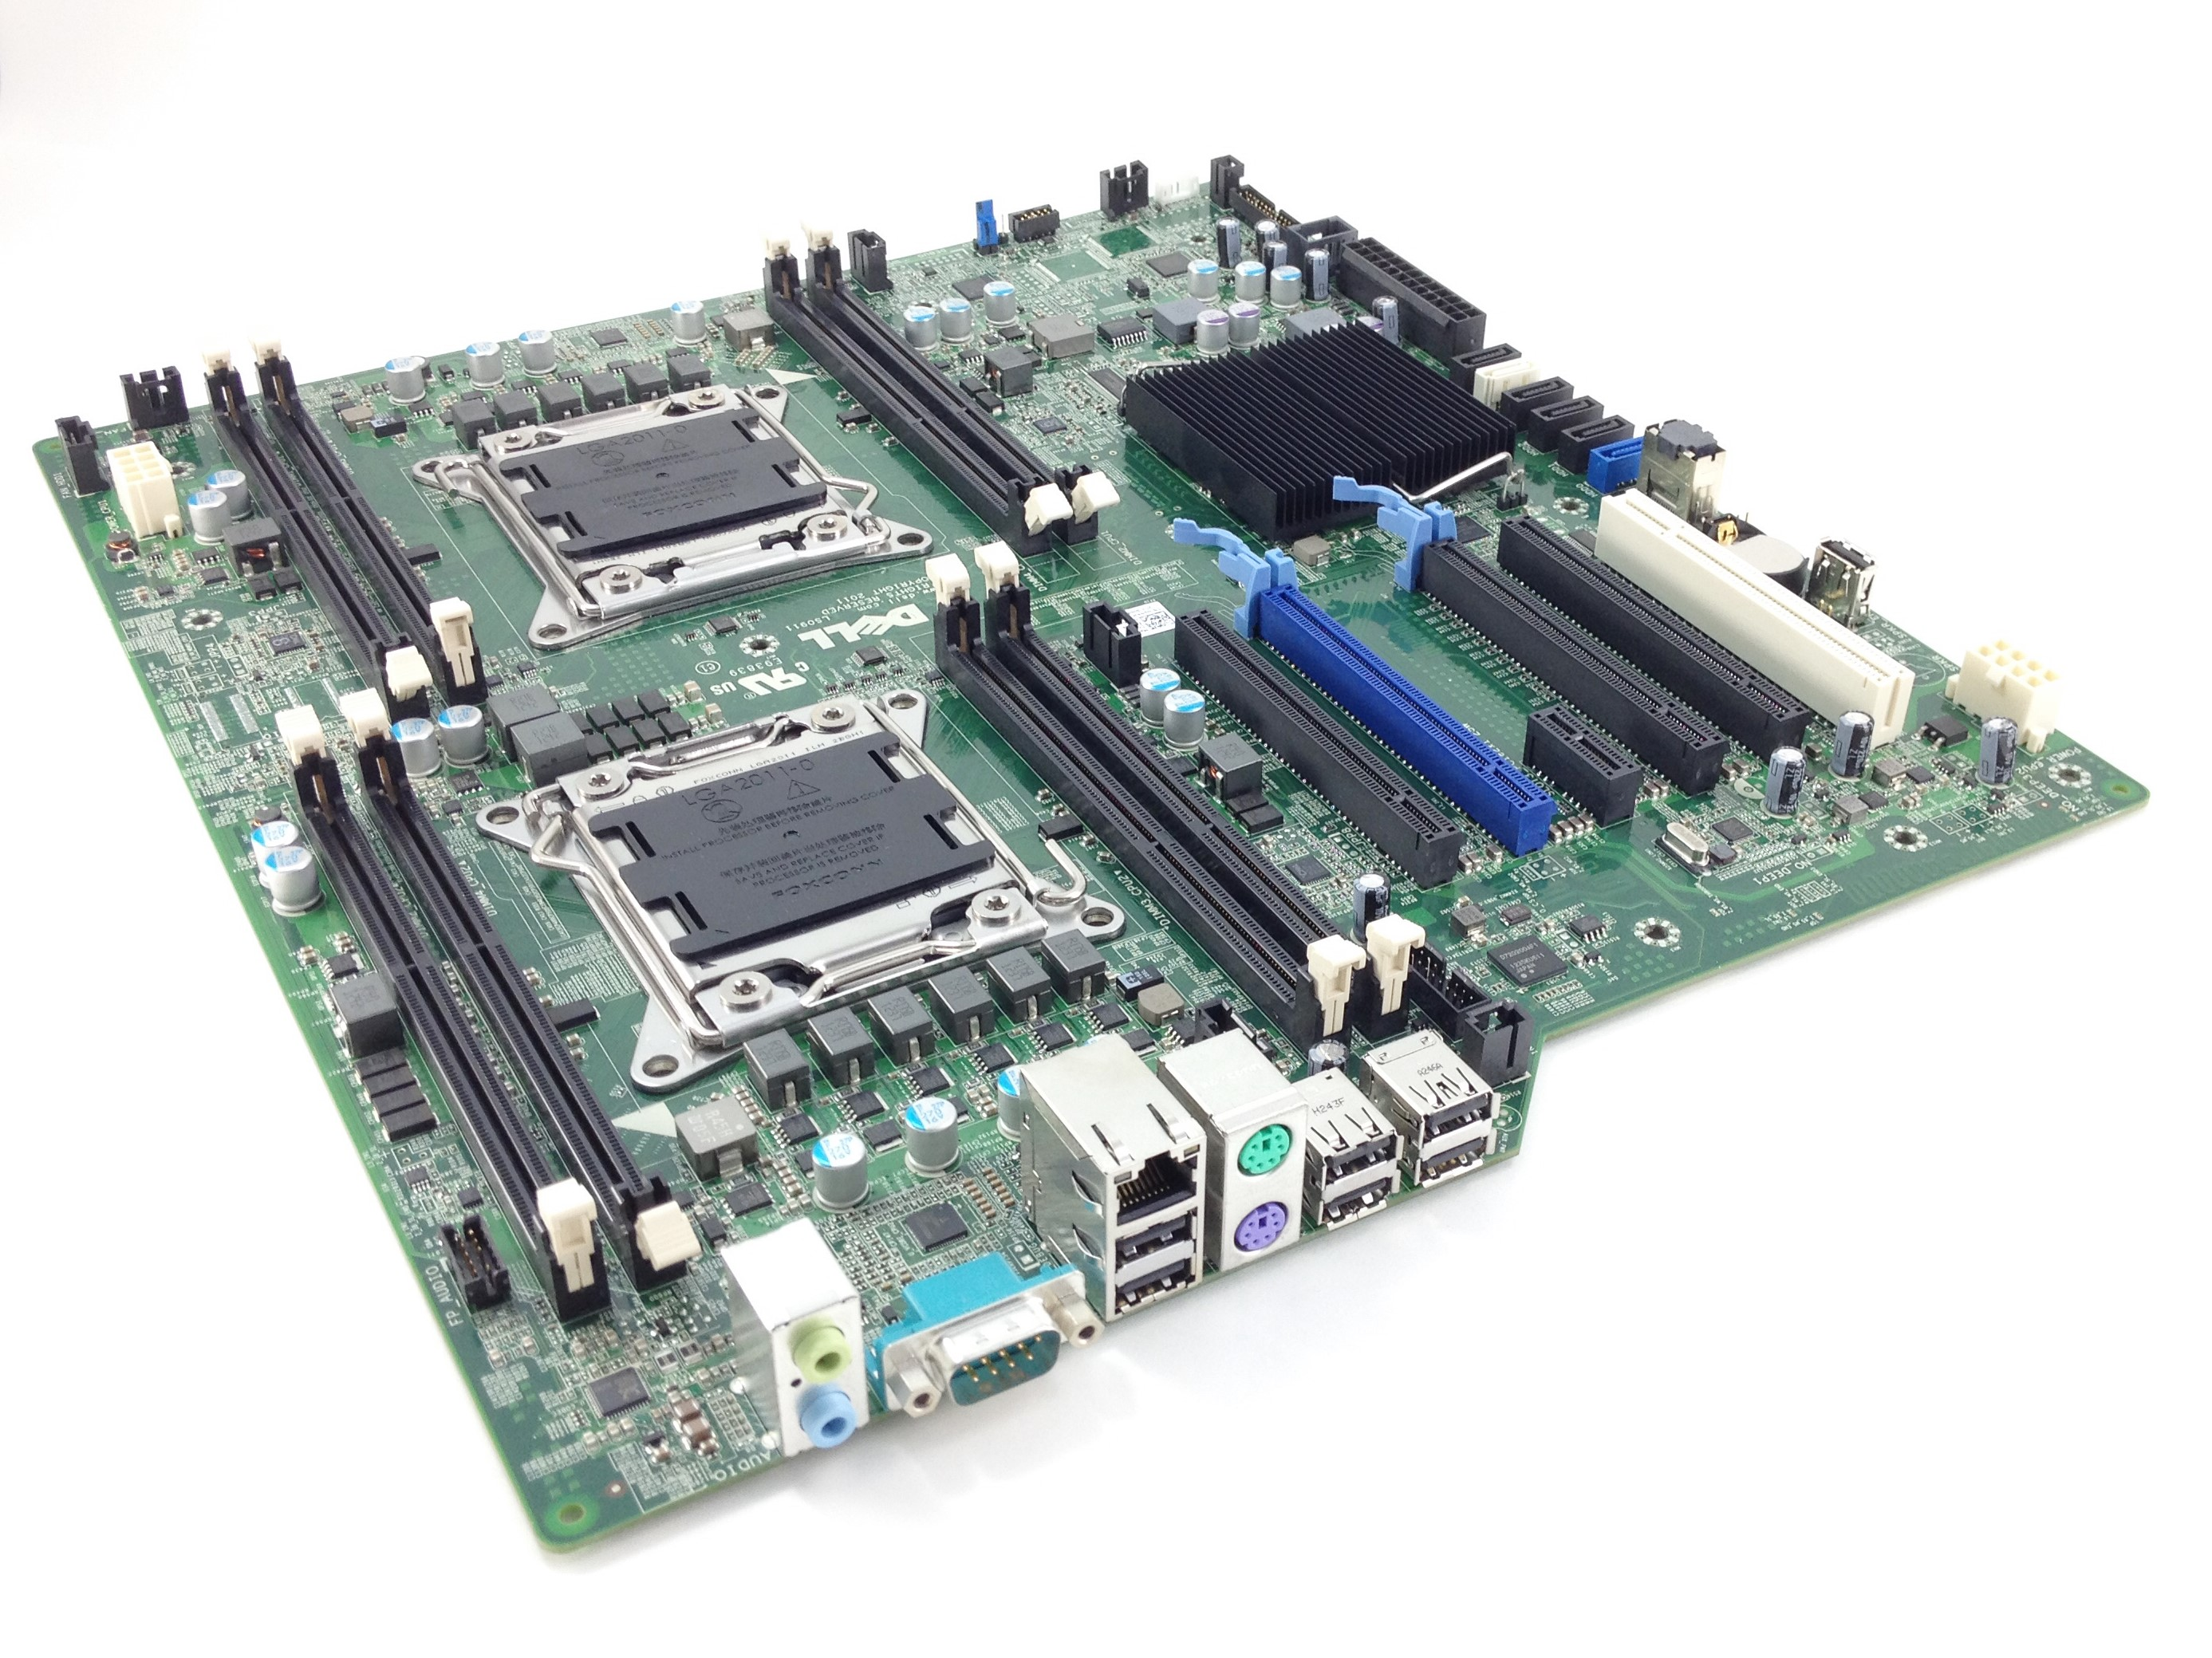 Dell Precision T5600 Dual Socket LGA2011 System Board (0GN6JF)